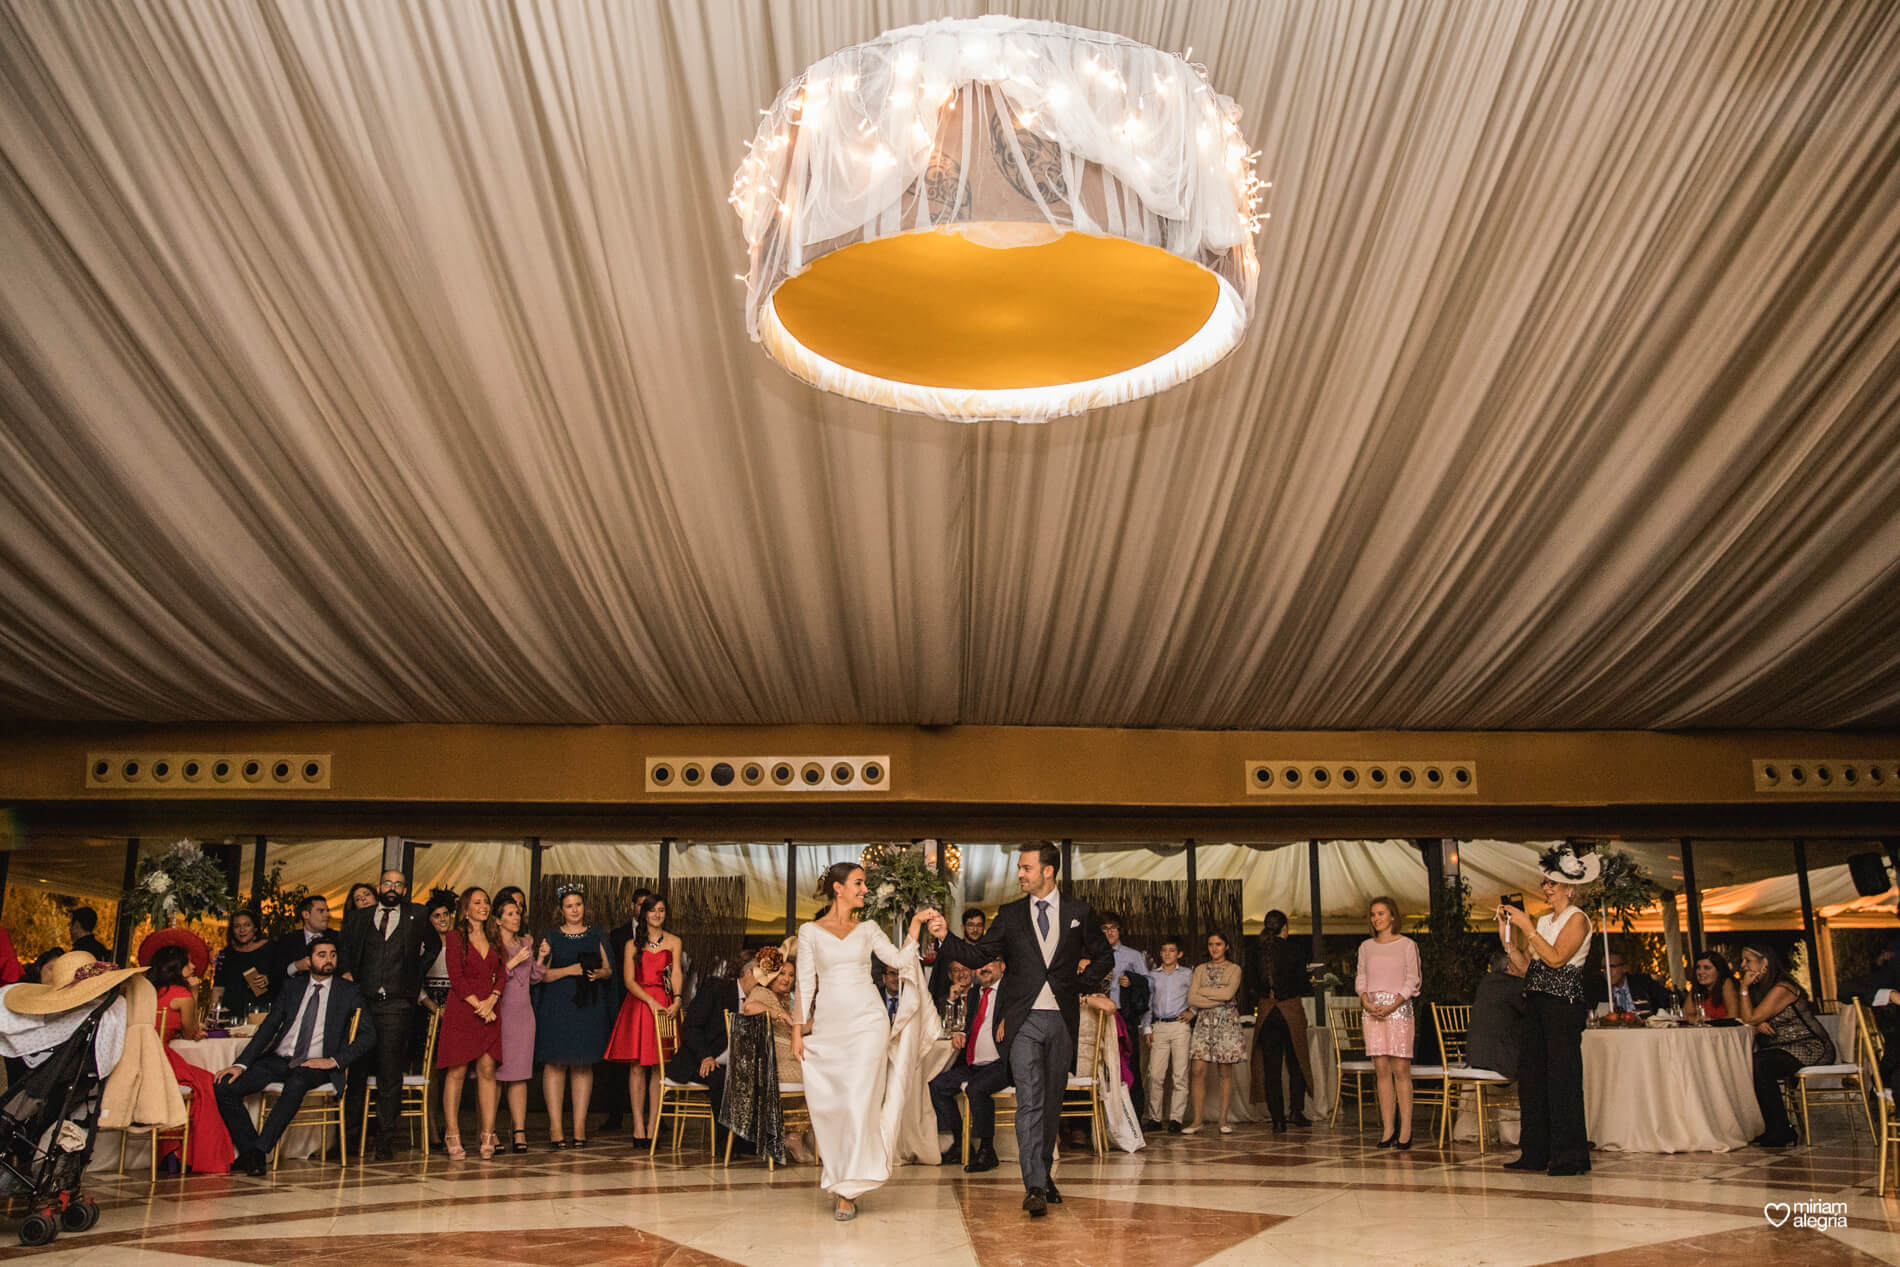 vestido-de-novia-paula-del-vas-miriam-alegria-fotografos-boda-murcia-147